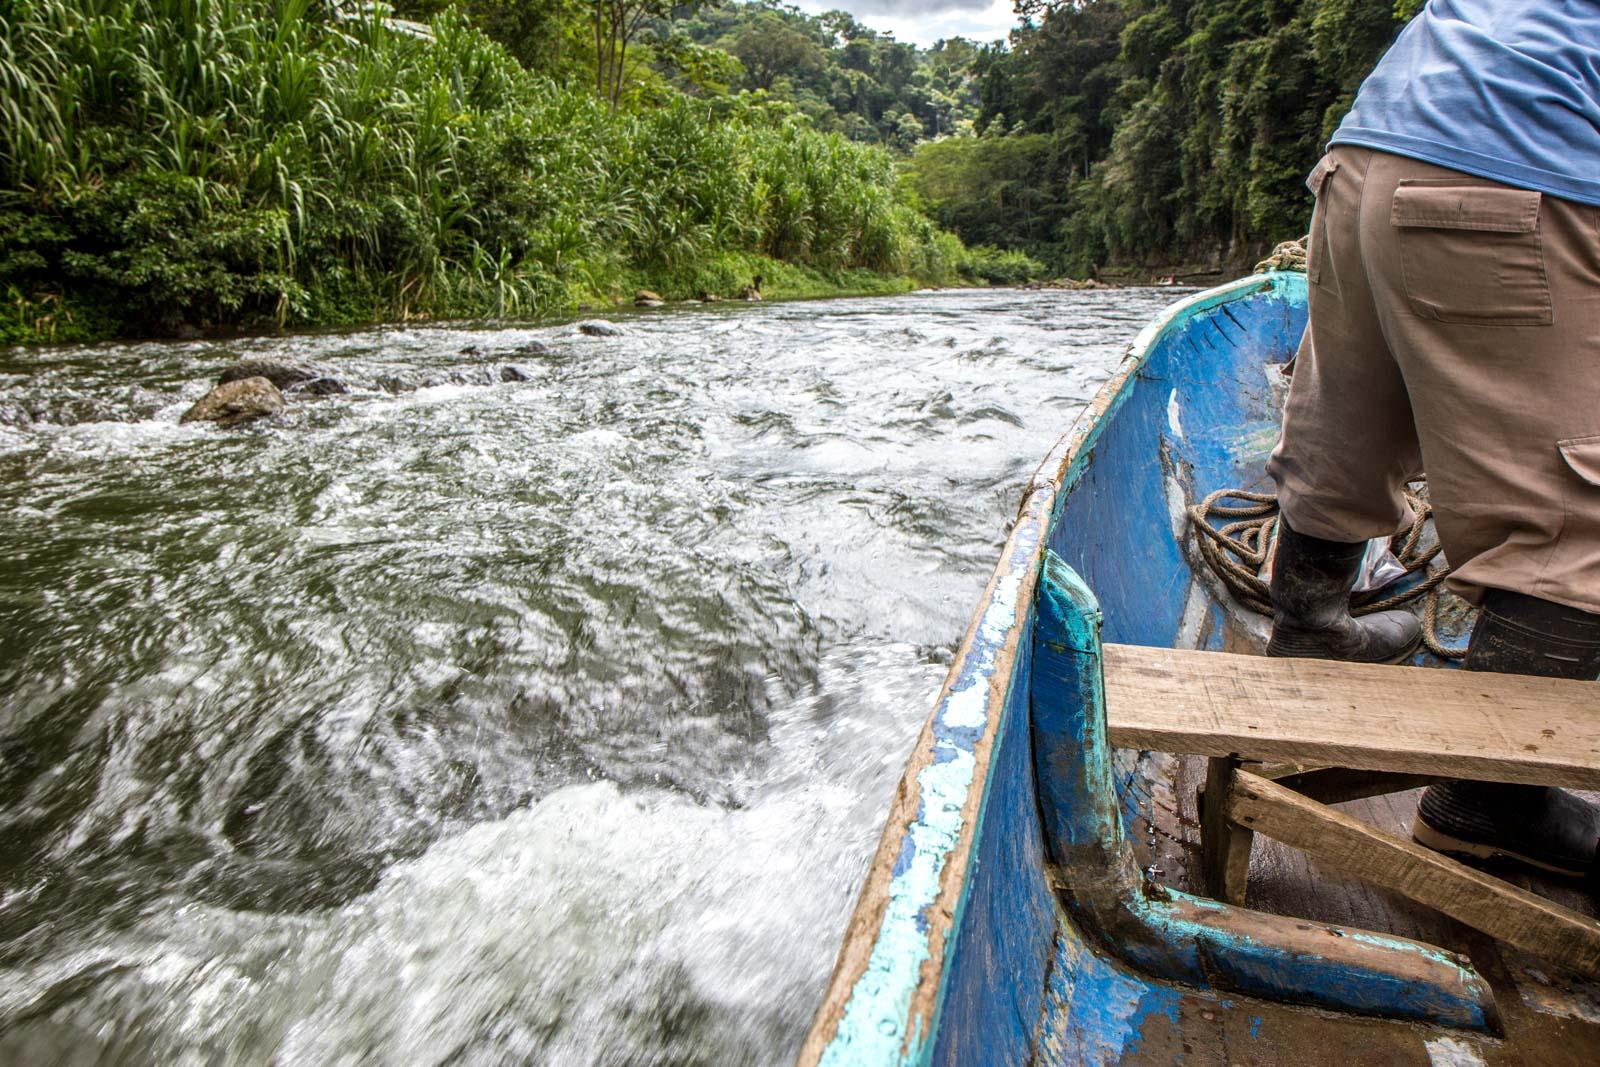 Yorkin Indigenous Reserve tour, bribri community, Puerto Viejo, Costa Rica